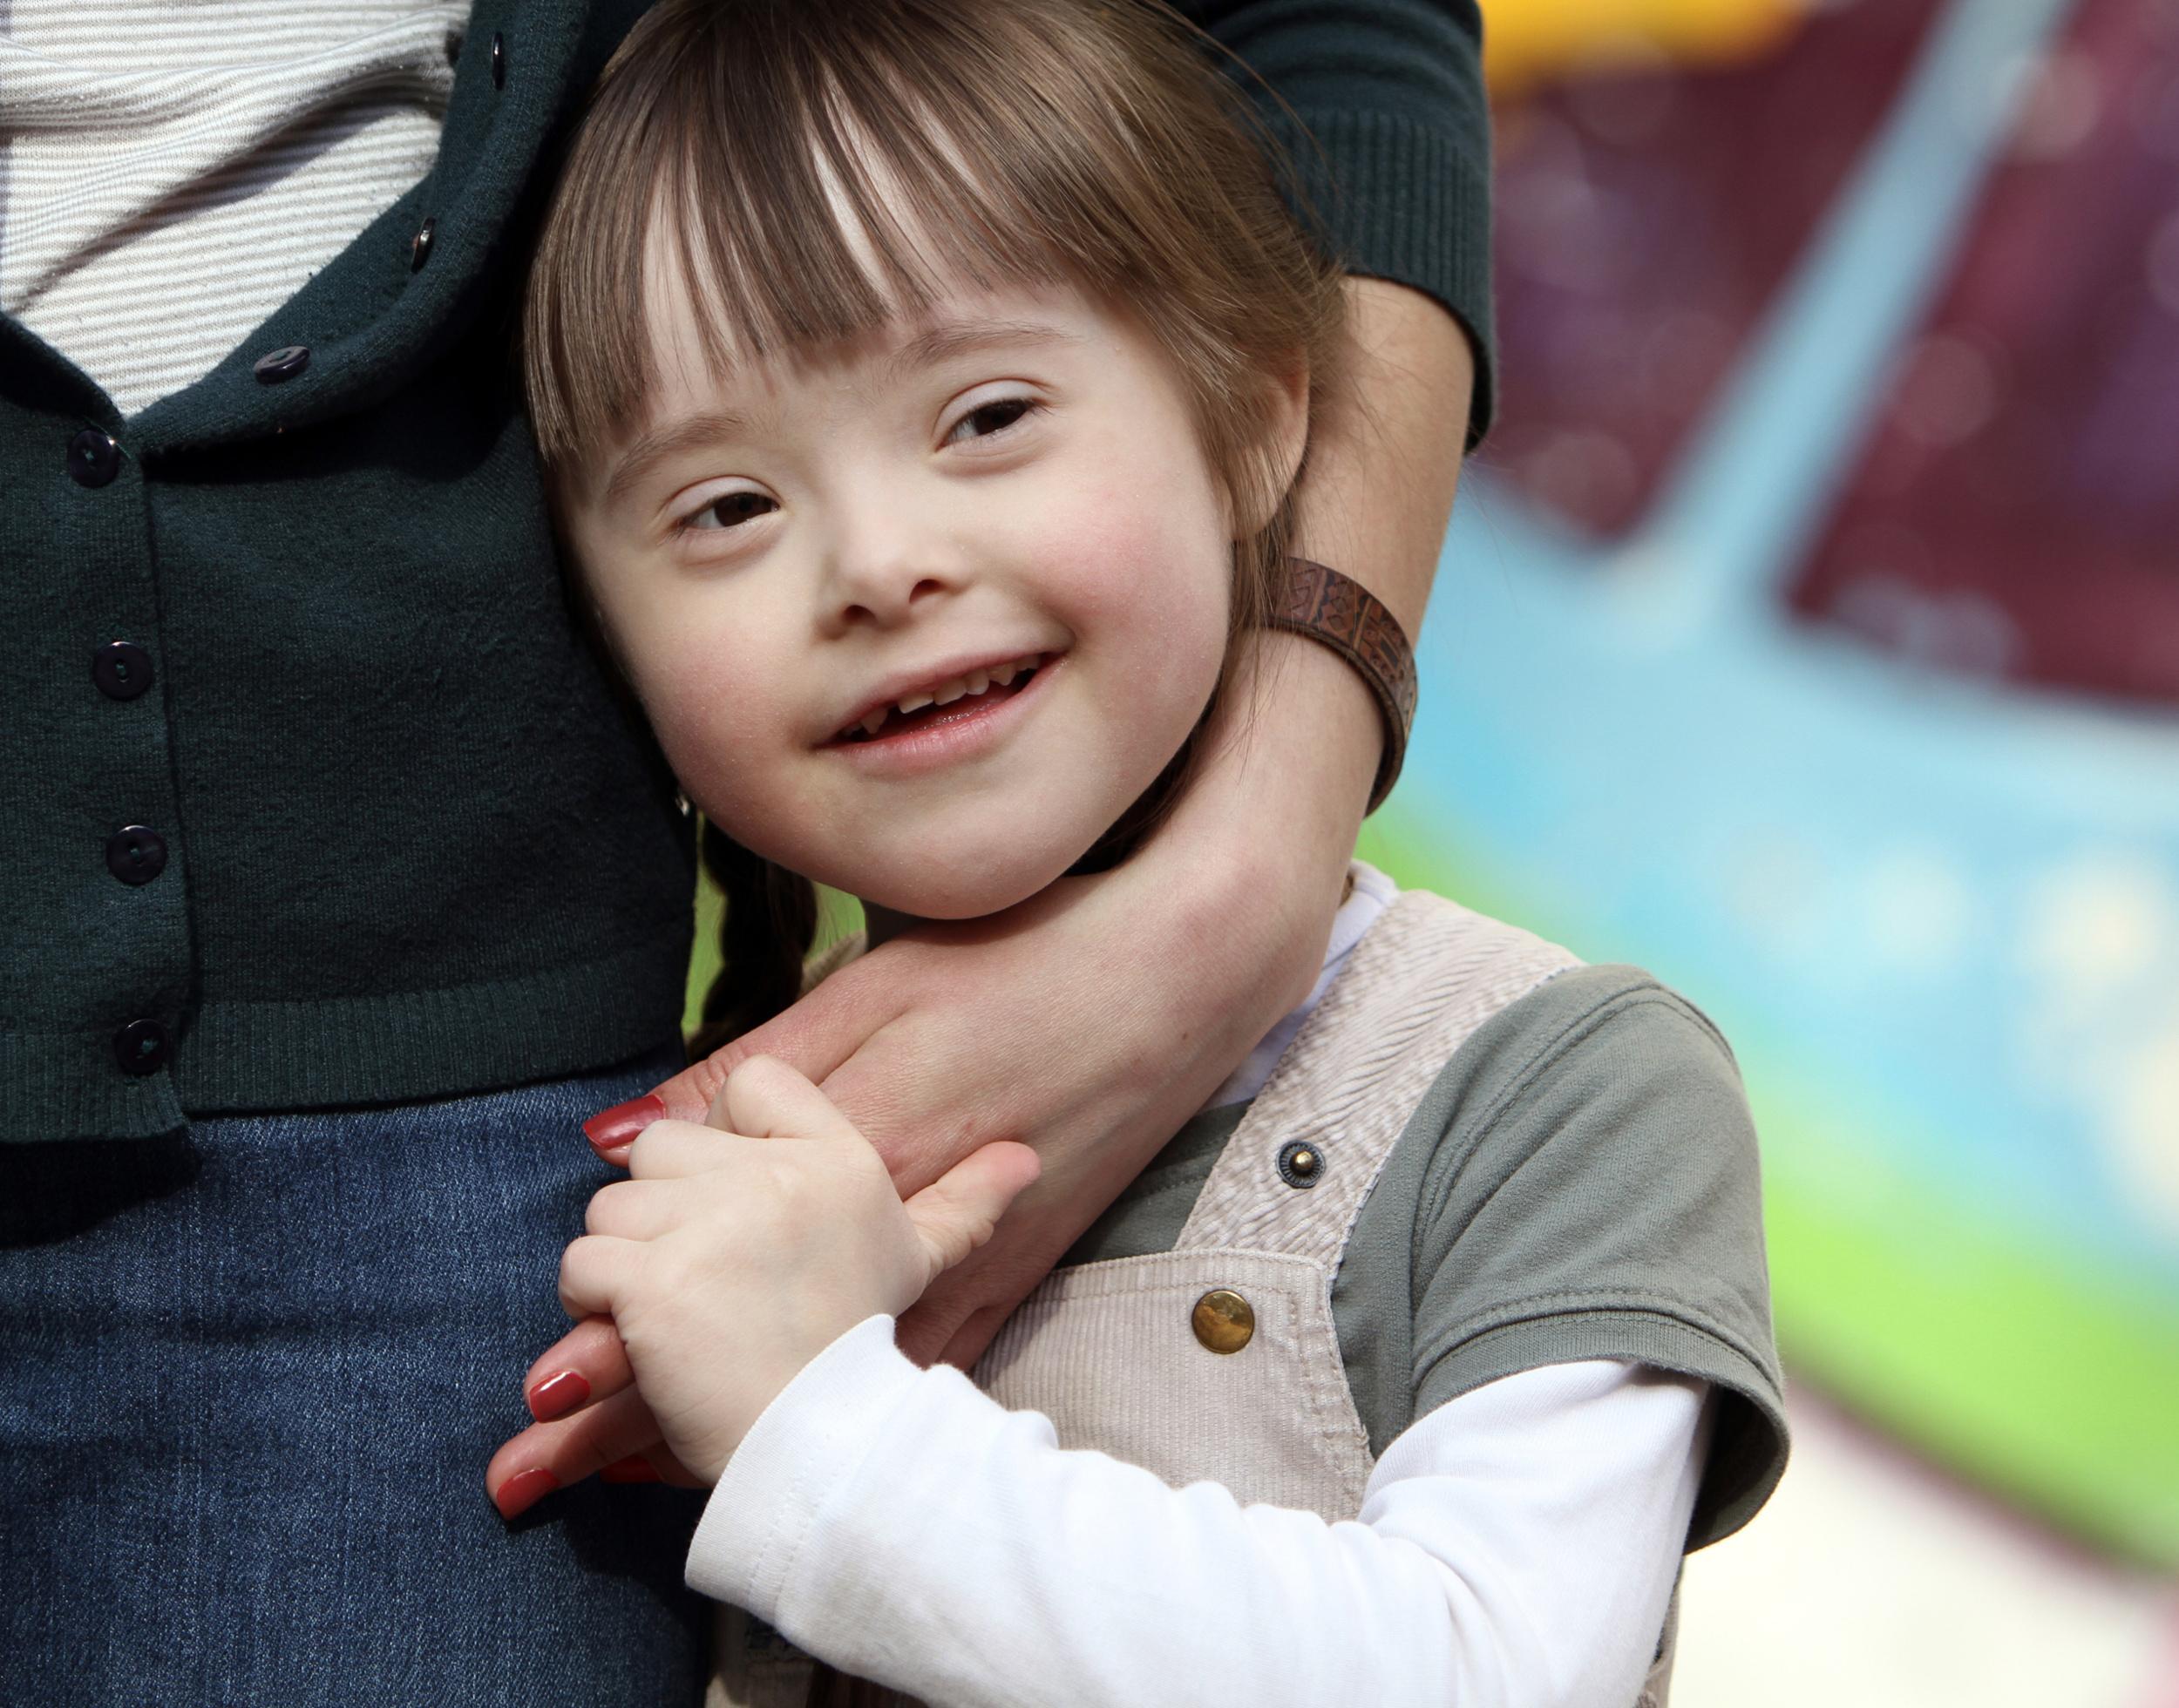 Abtreibung Bei Behinderung Pro Femina